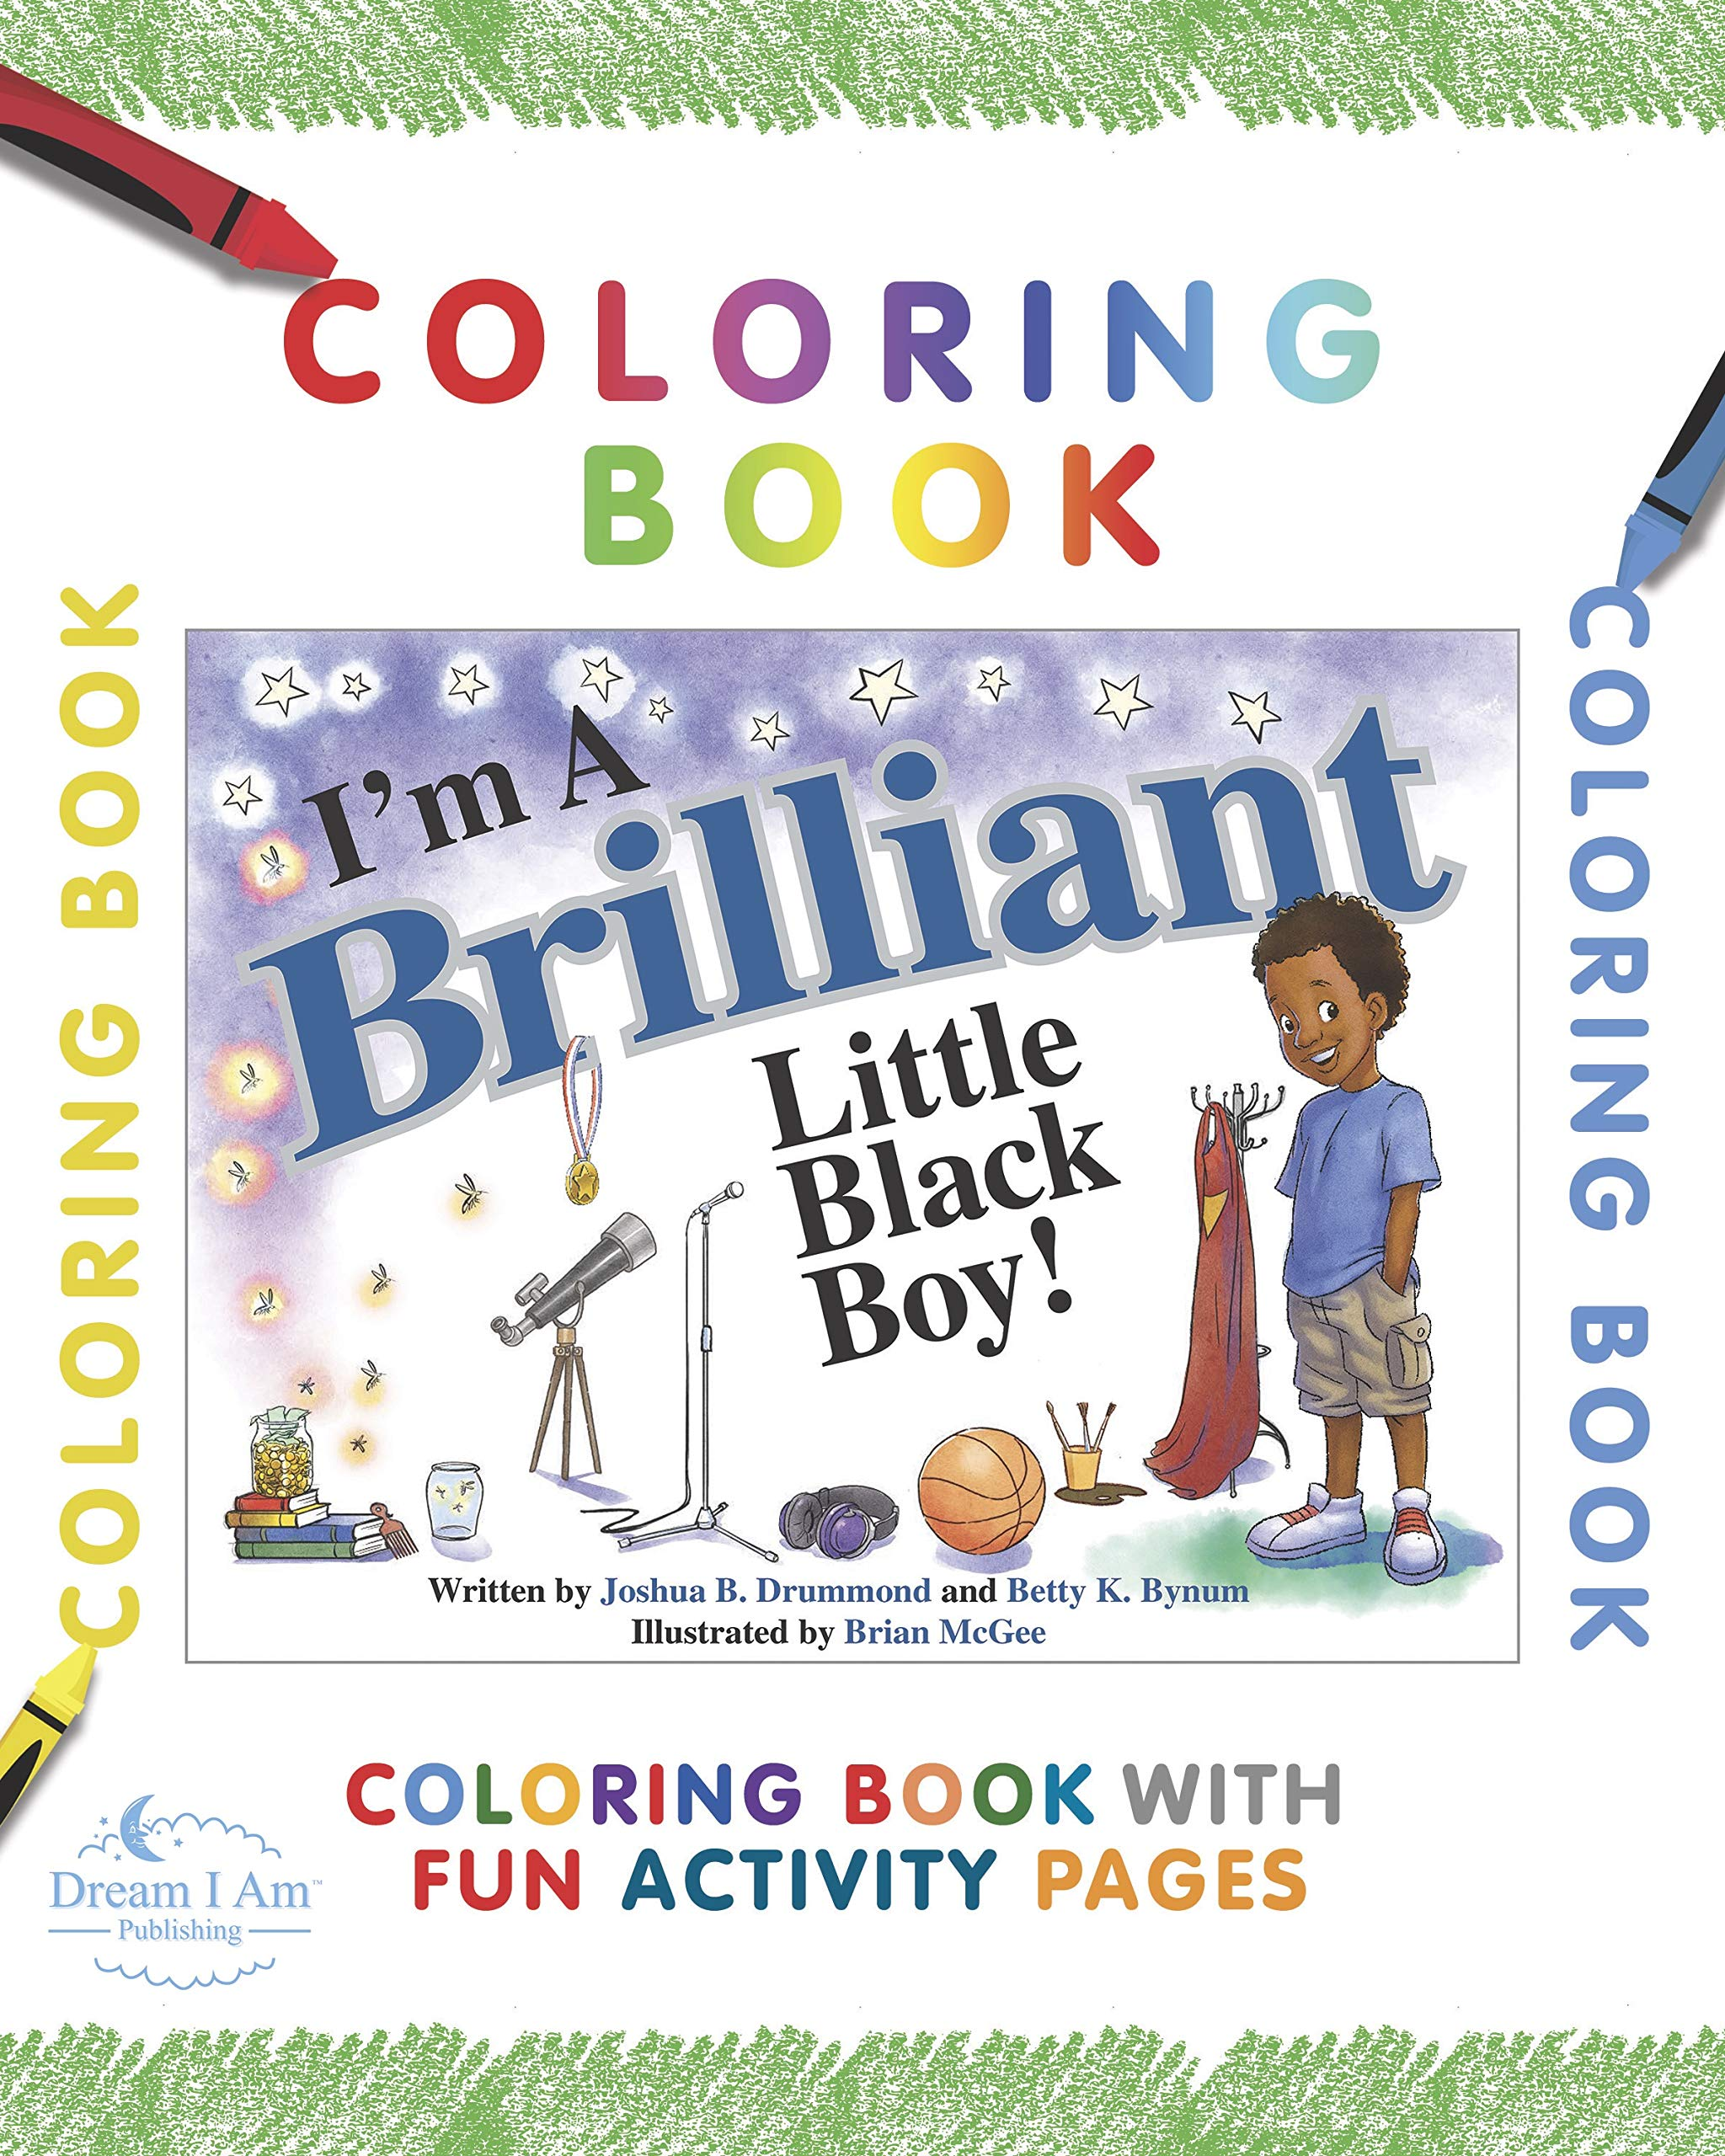 I M A Brilliant Little Black Boy Coloring Book Companion Betty K Bynum Joshua B Drummond Brian Mcgee Melissa Swenson Melissa Swenson Based On Original Art By Brian Mcgee Brian Mcgee 9781792308079 Amazon Com